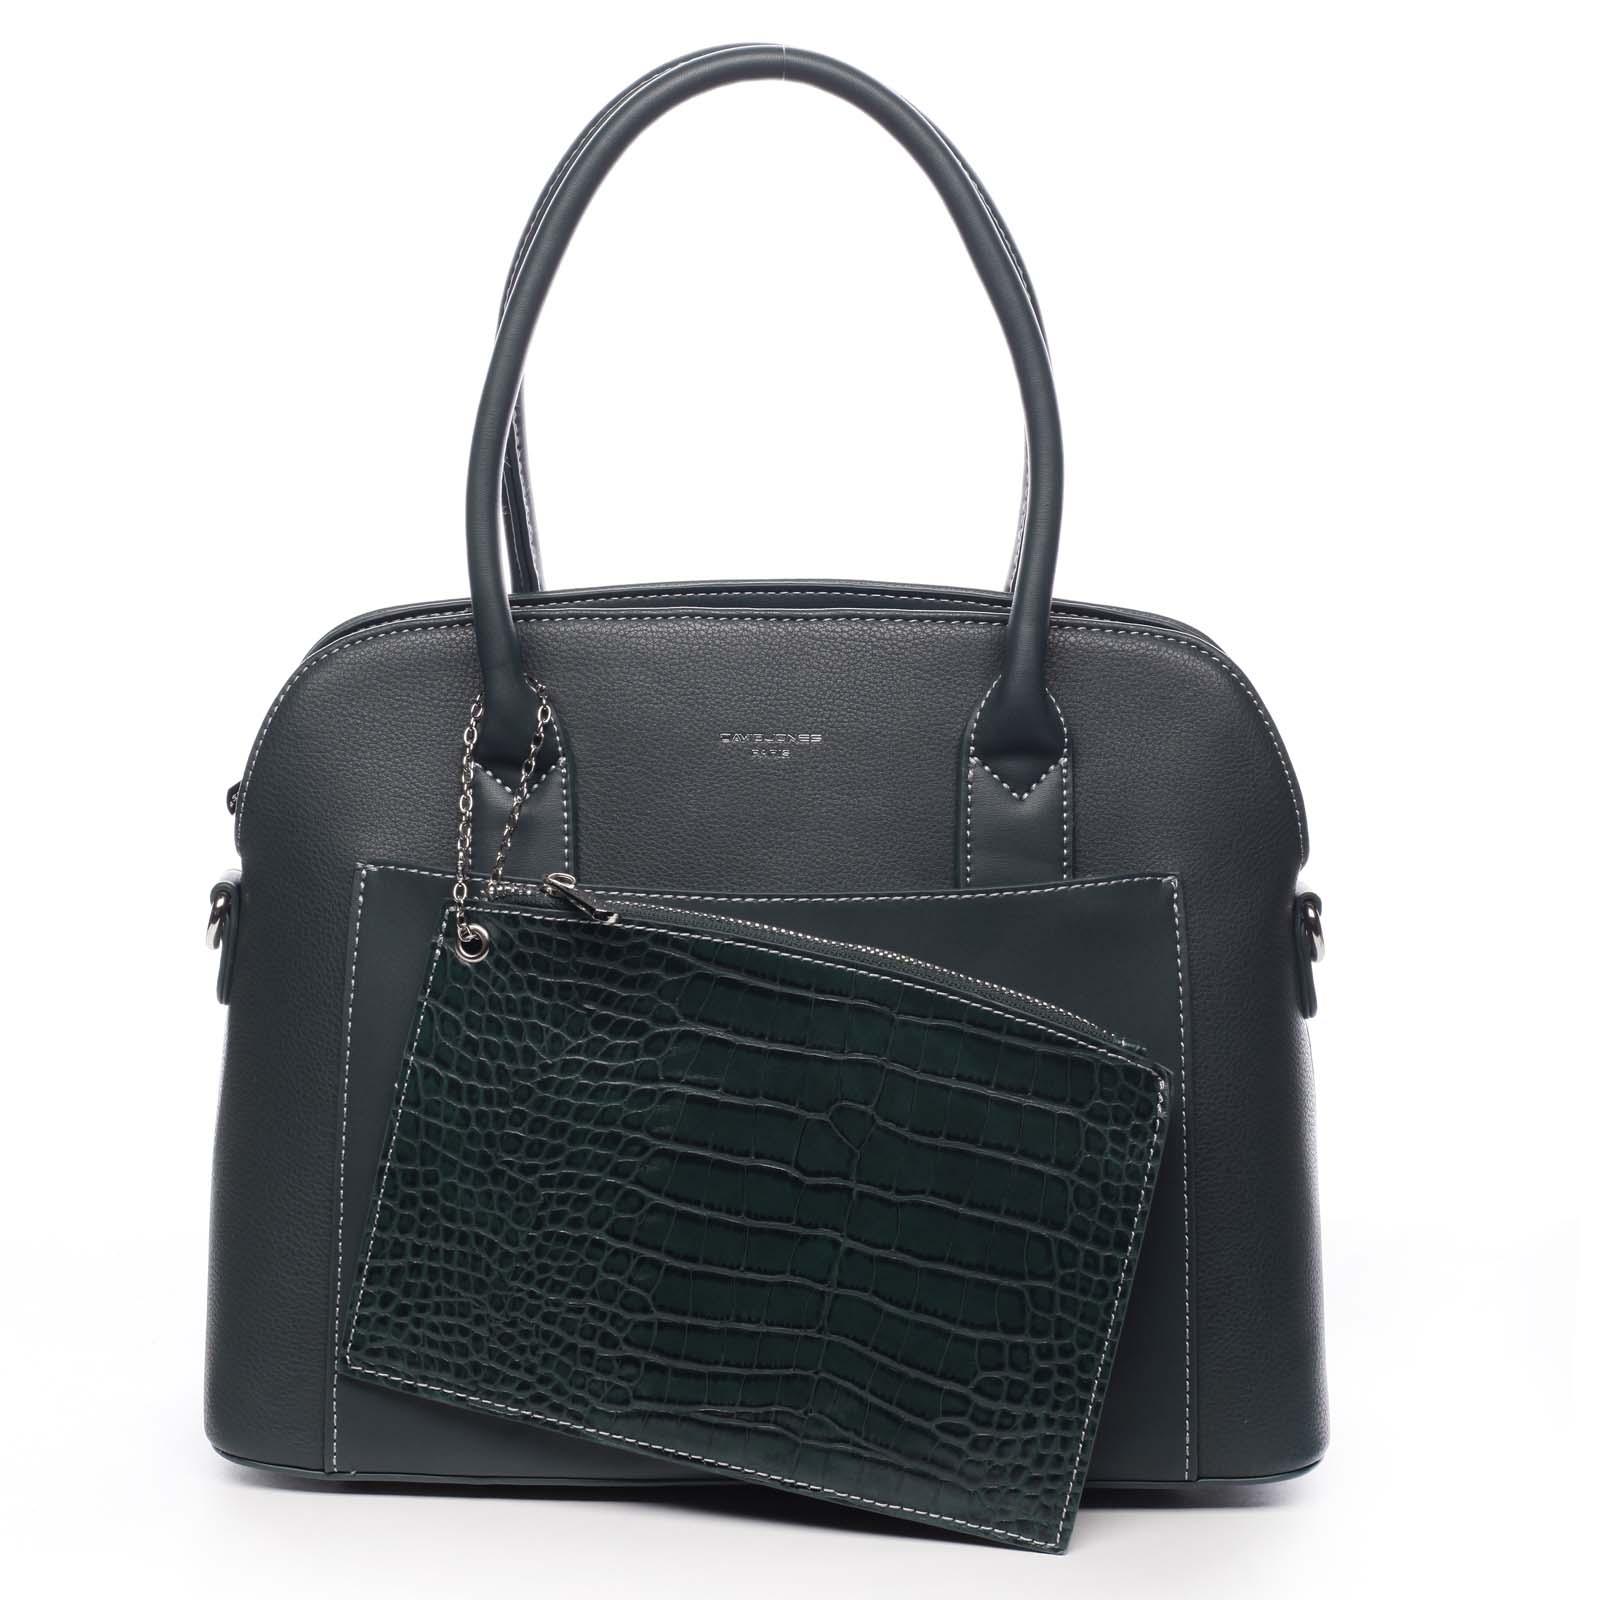 Dámská kabelka tmavě zelená - David Jones Caleed